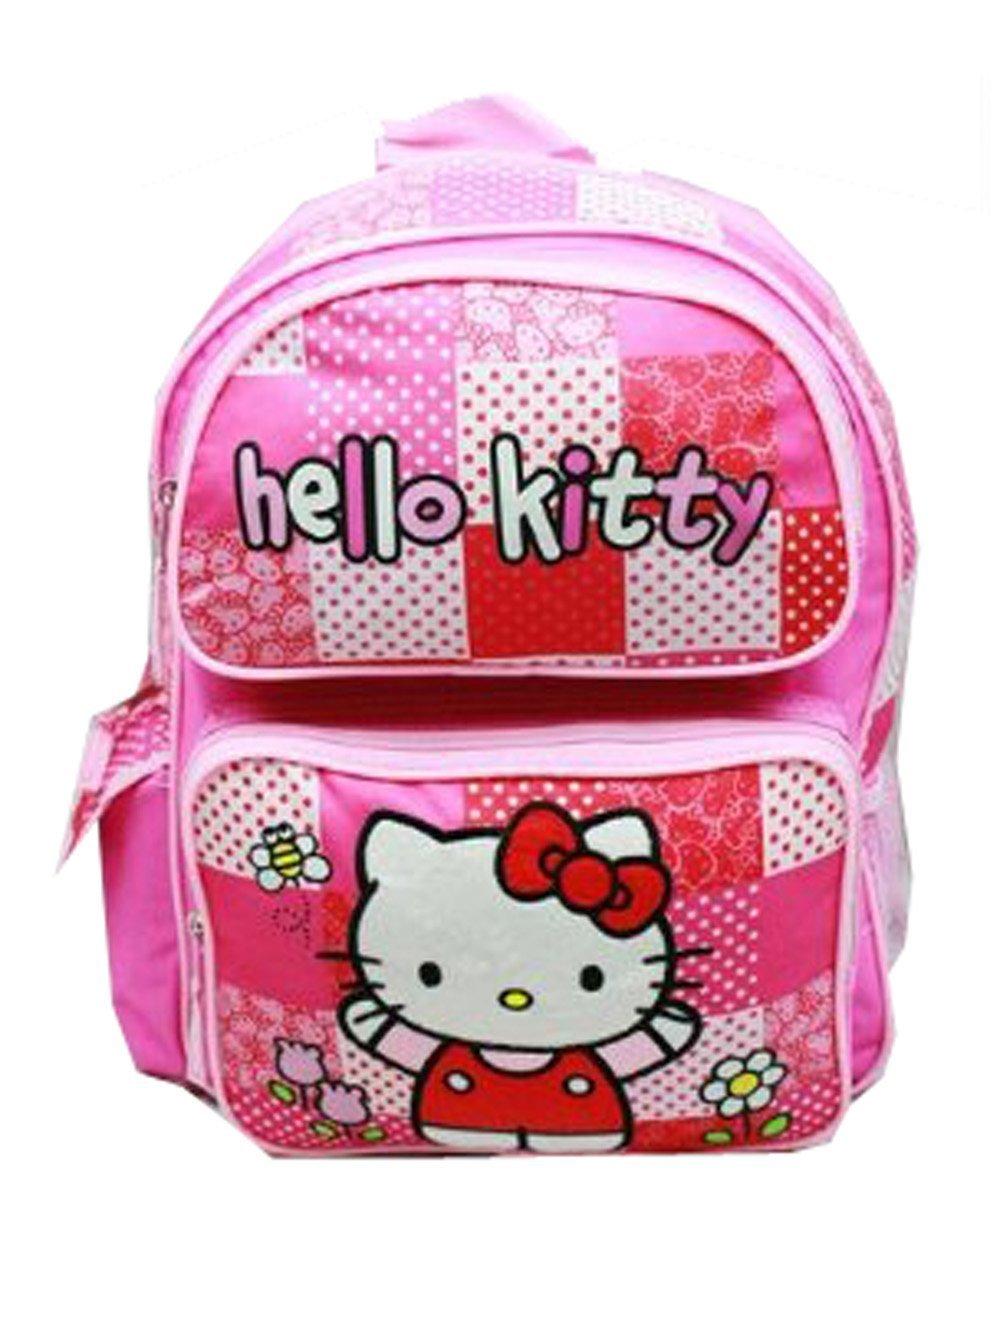 Medium Backpack - Hello Kitty - Pink/Red Box New School Bag 82415   B00AY8DX48